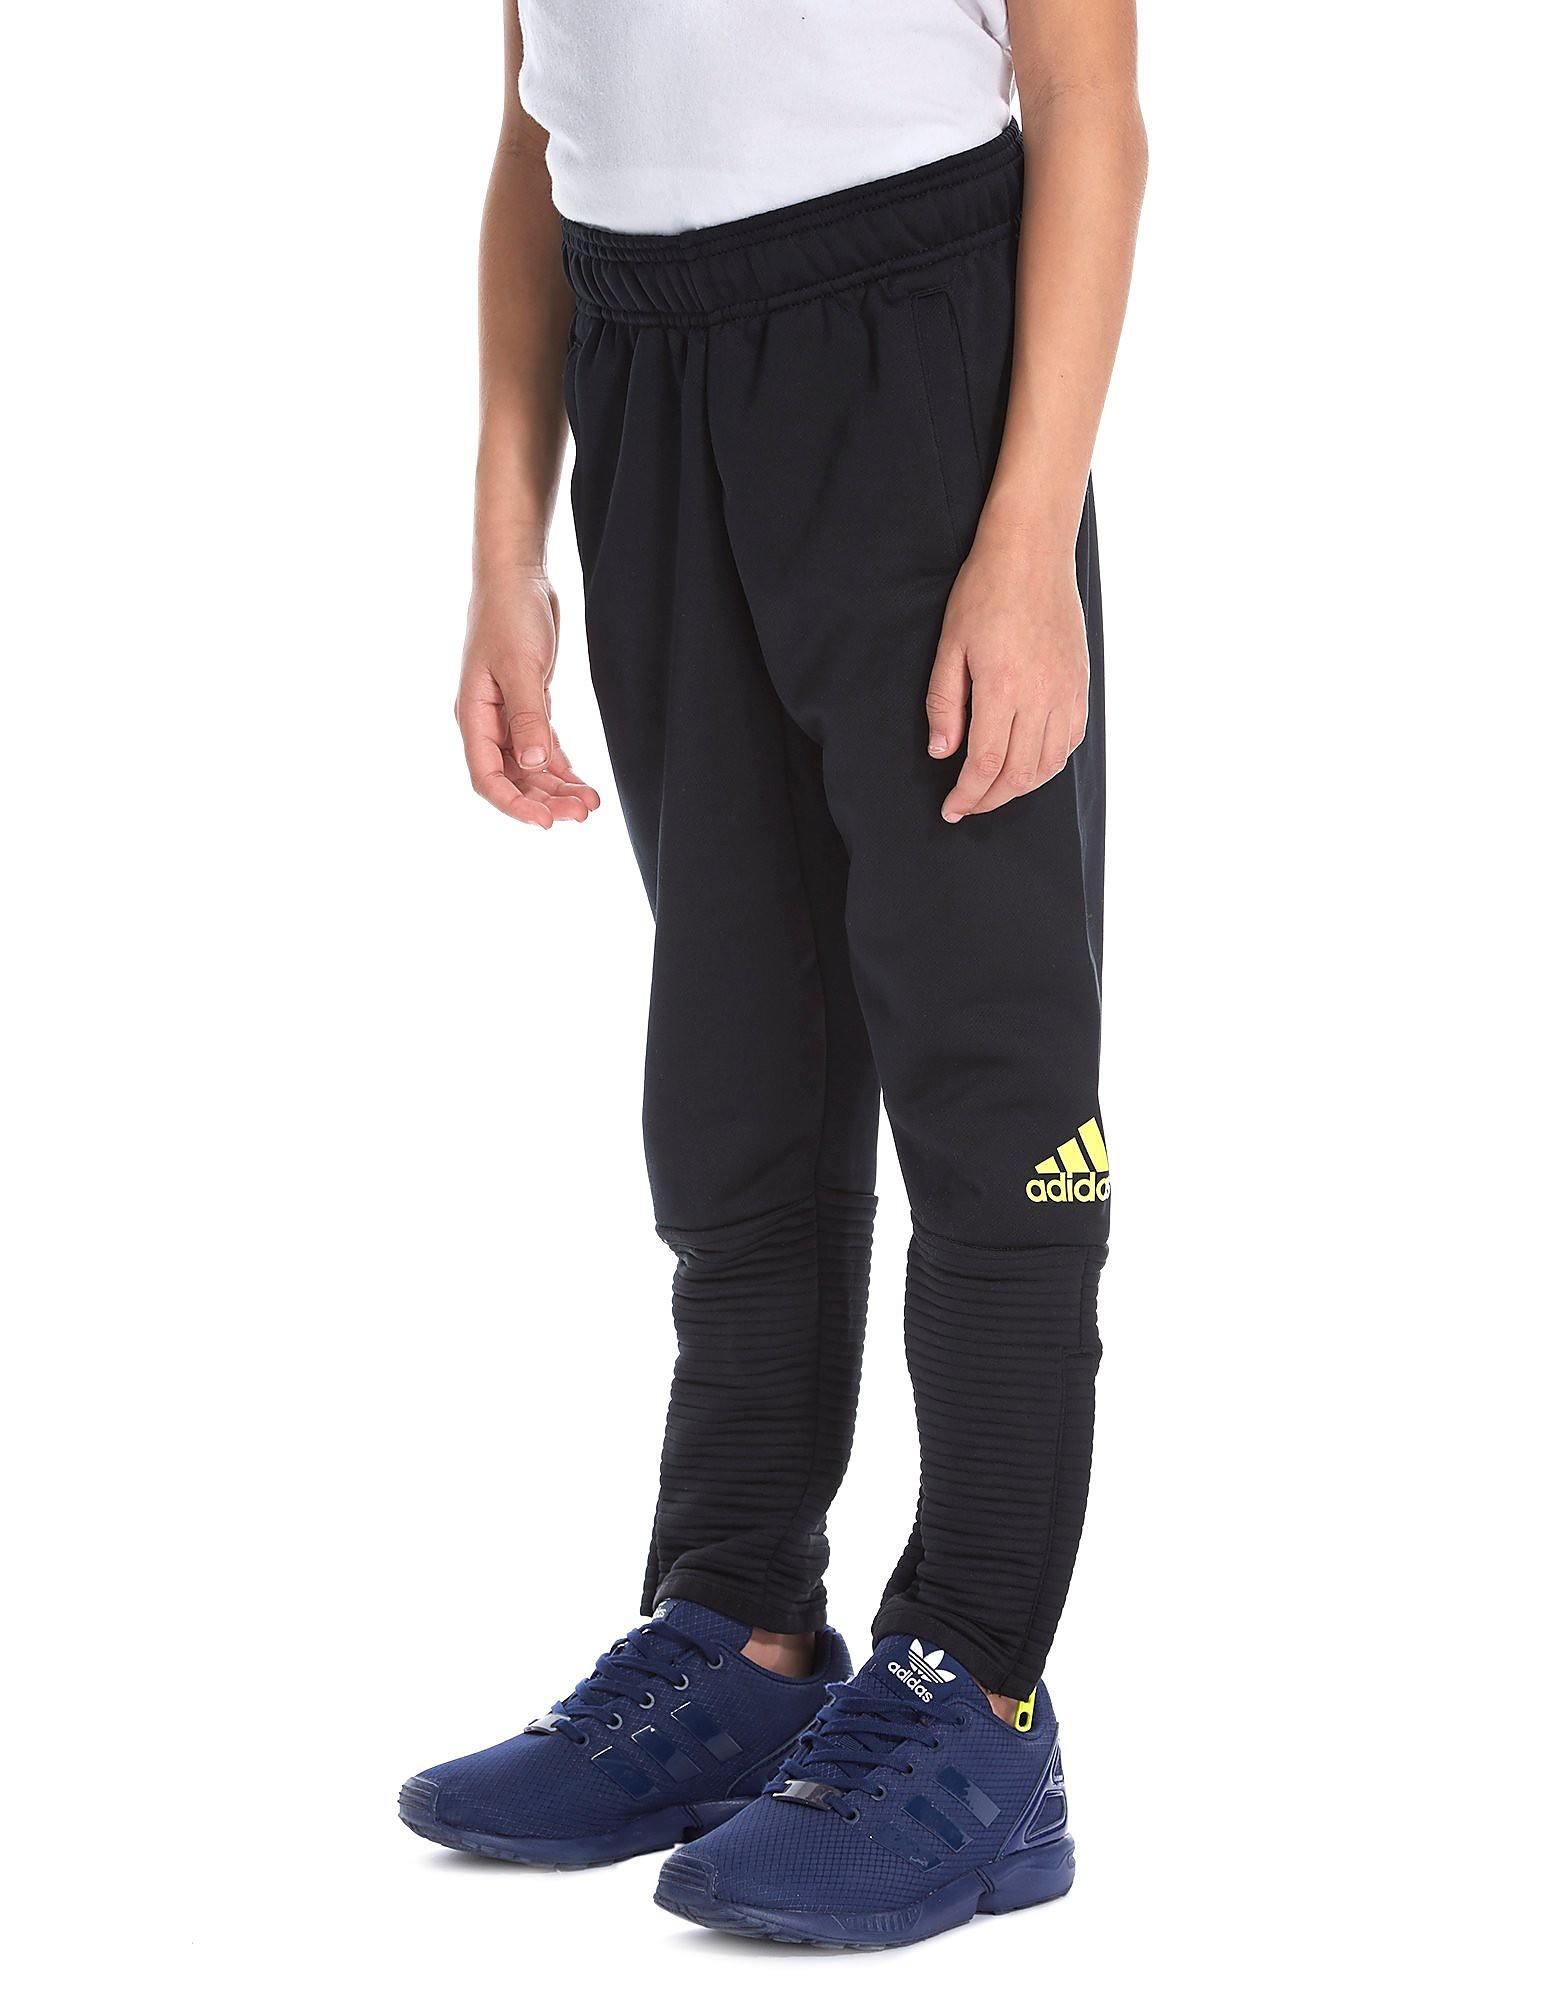 adidas Sport Tiro Pants Children